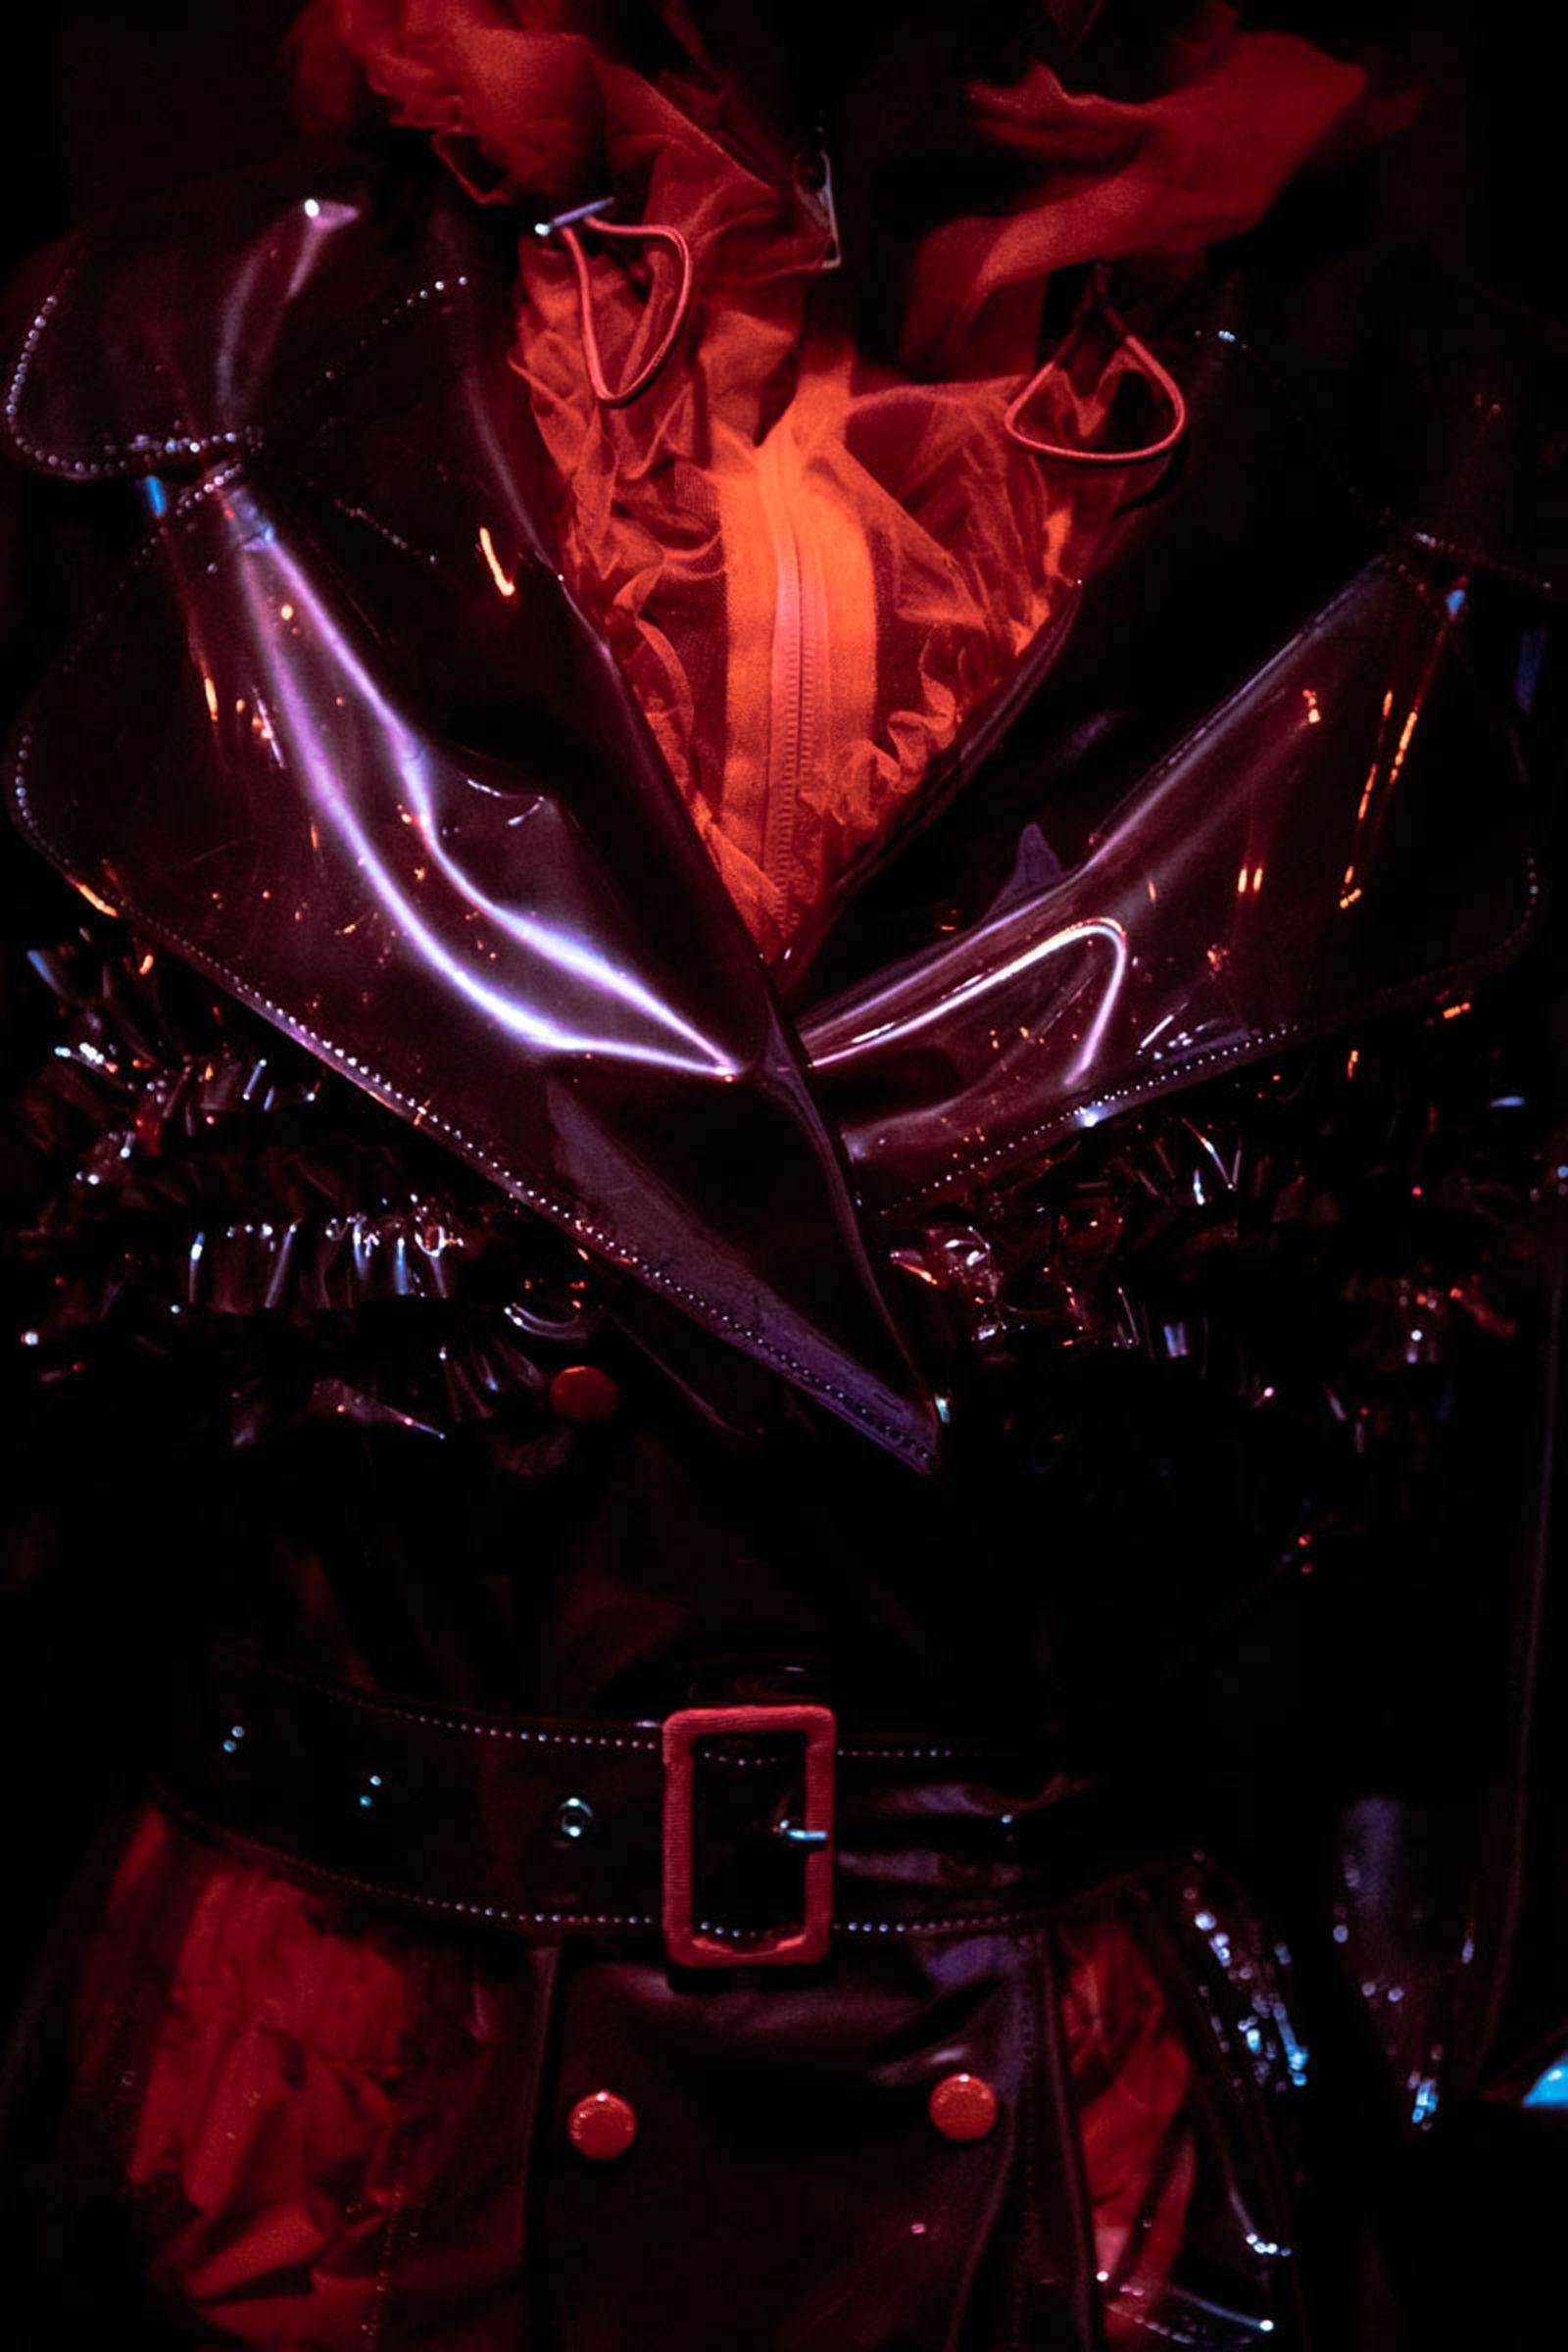 moncler-genius-fall-2020-simone-rocha-07